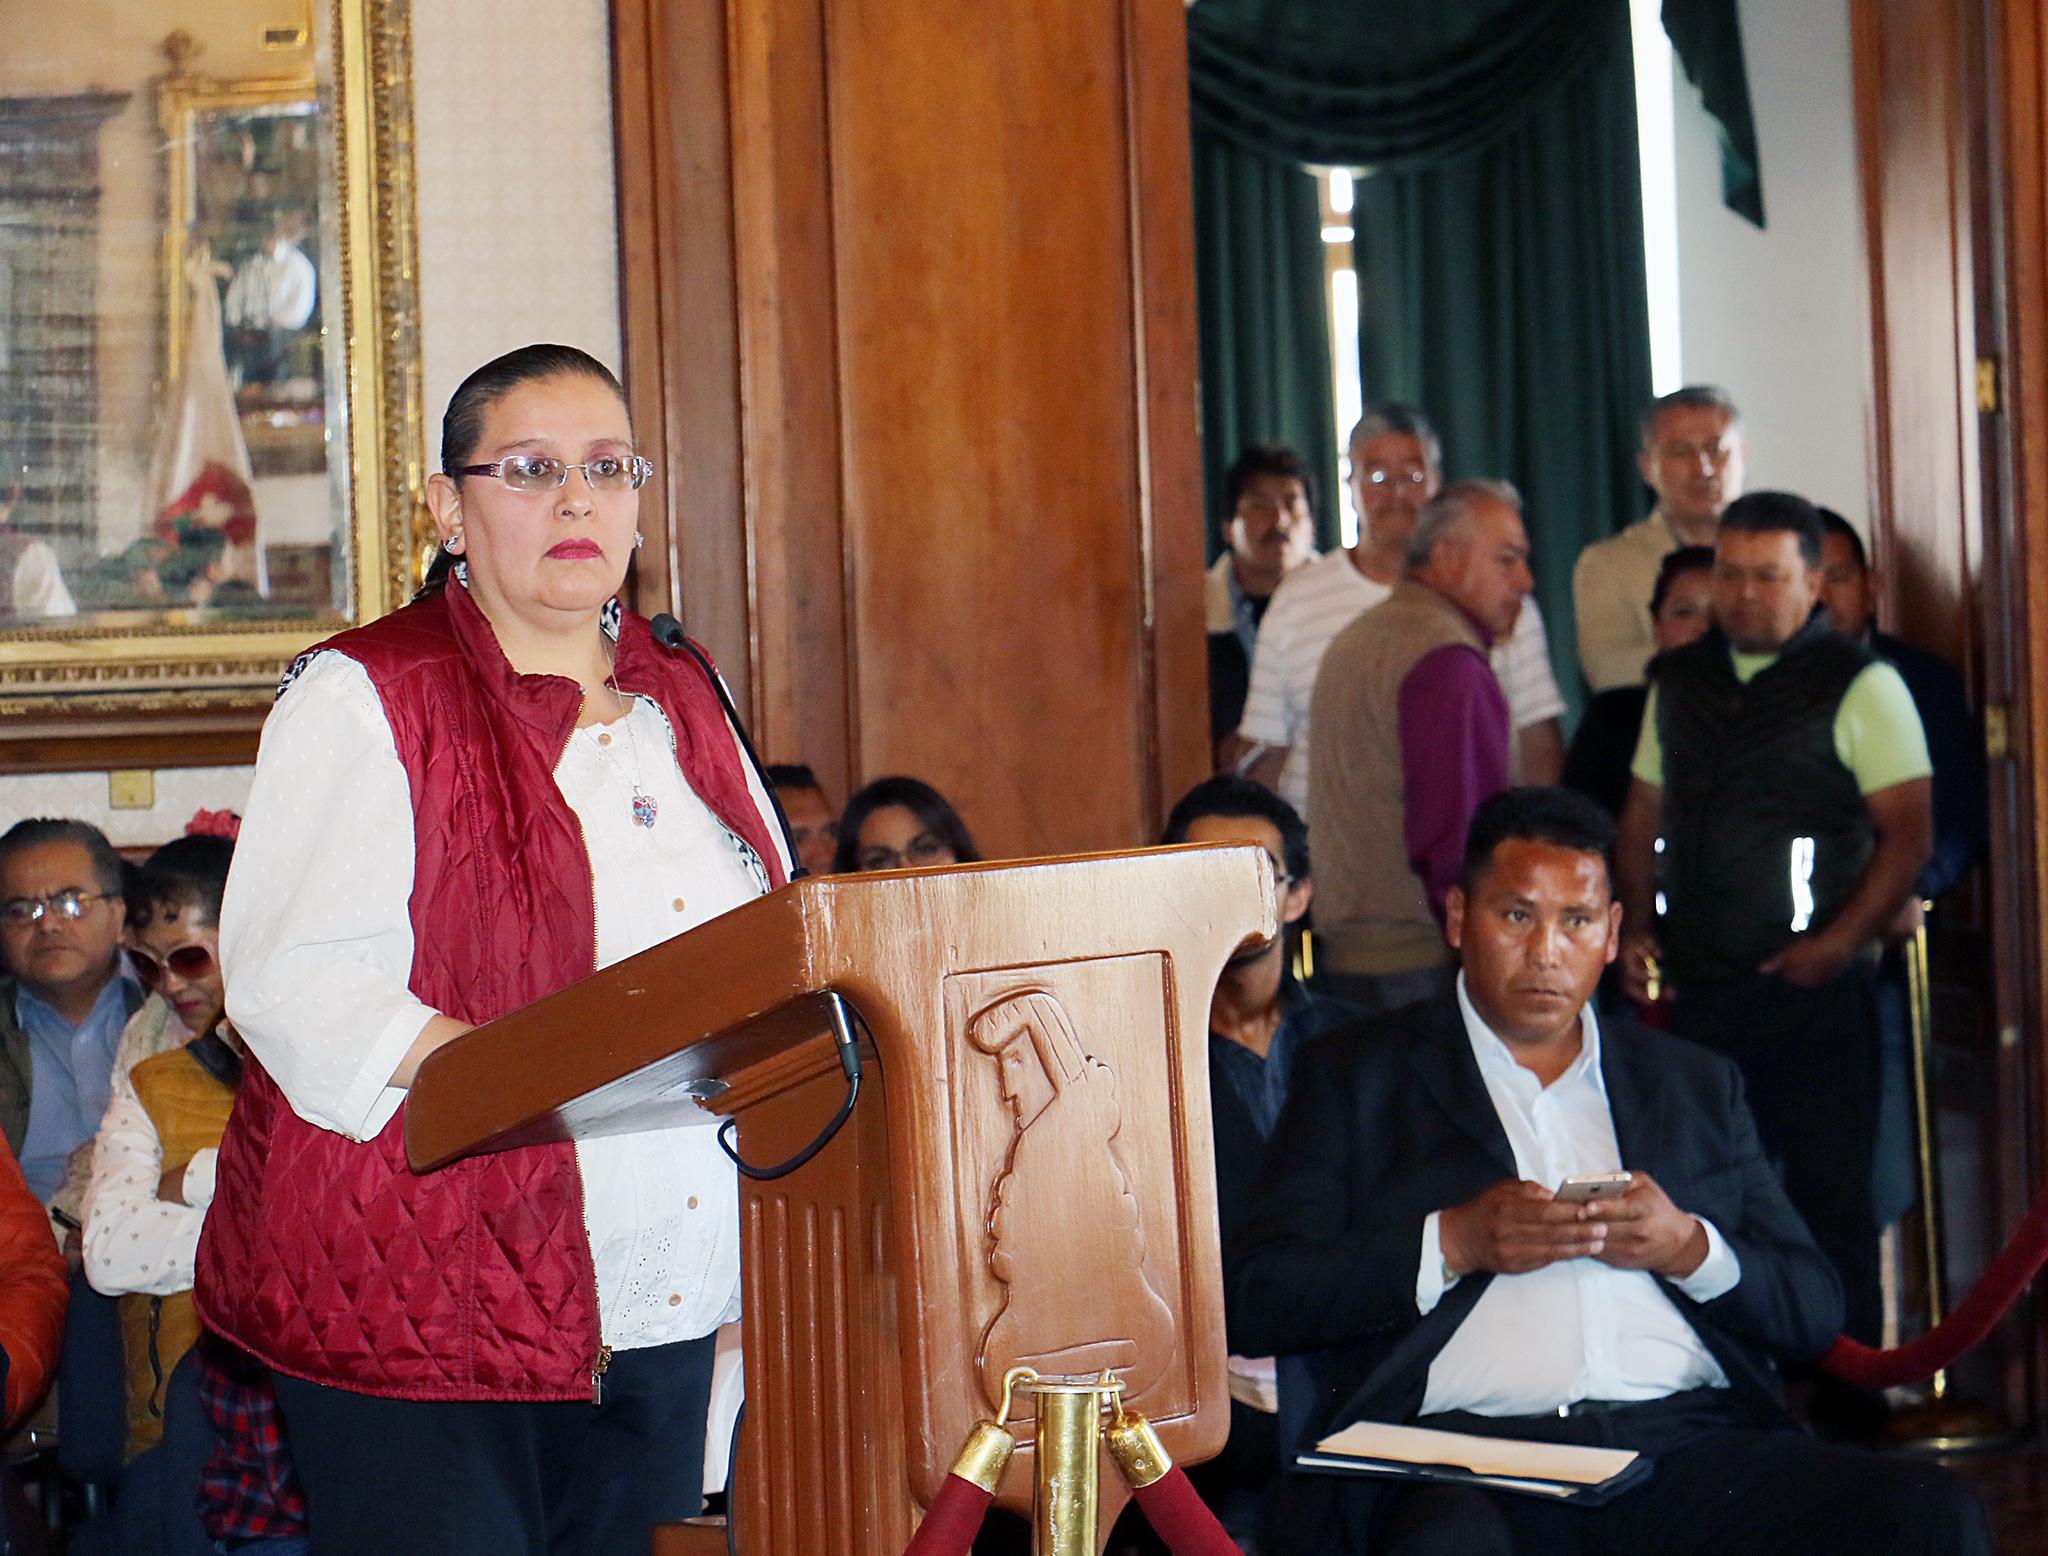 Anuncian cambio de 50 mil luminarias en Toluca